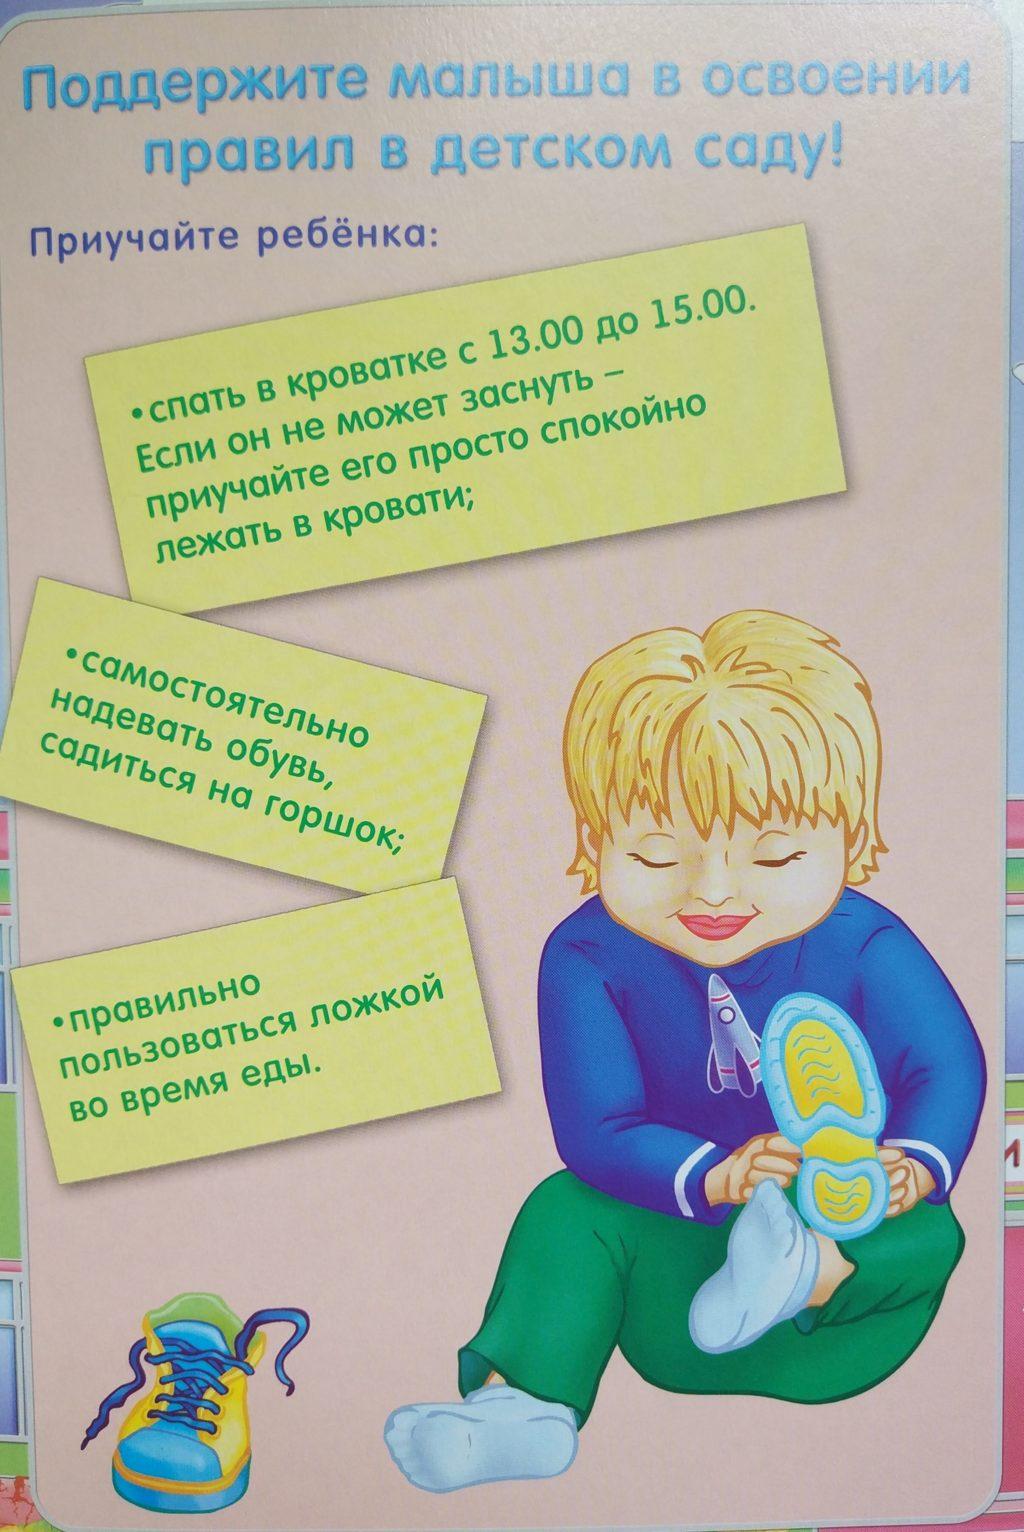 Постнова Инна Владимировна